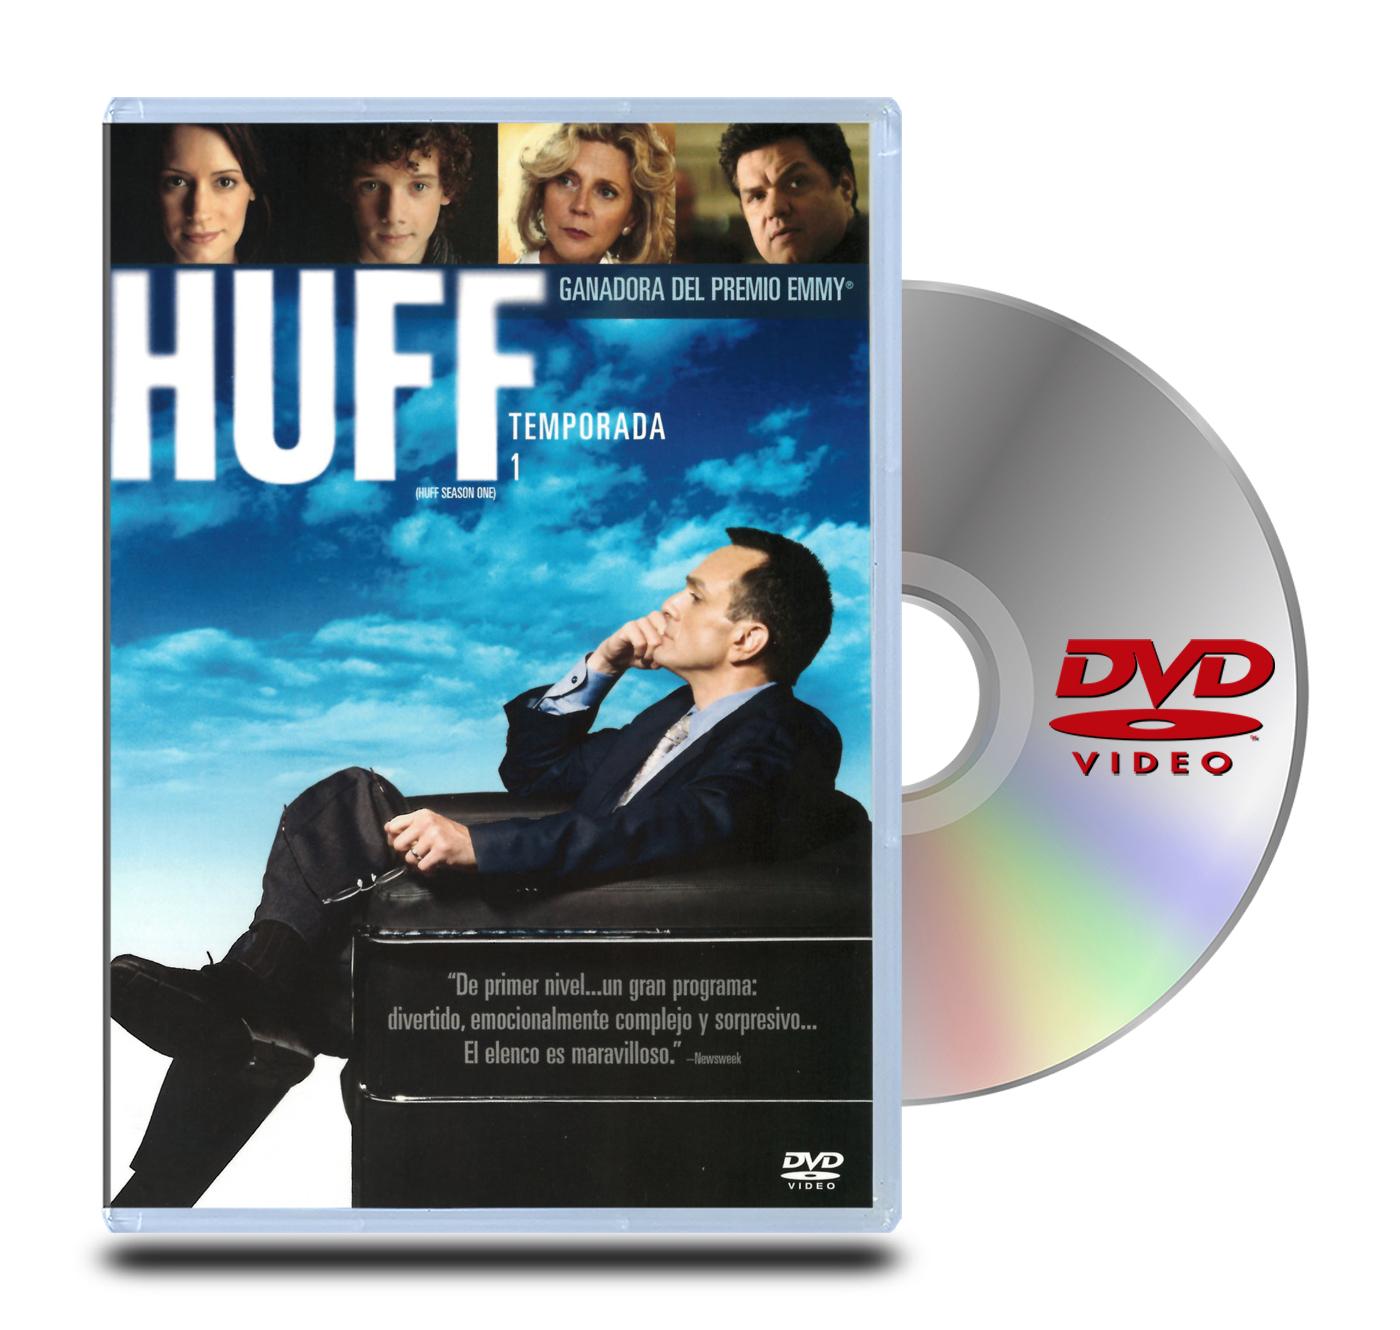 DVD Pack Huff (4 Discos)